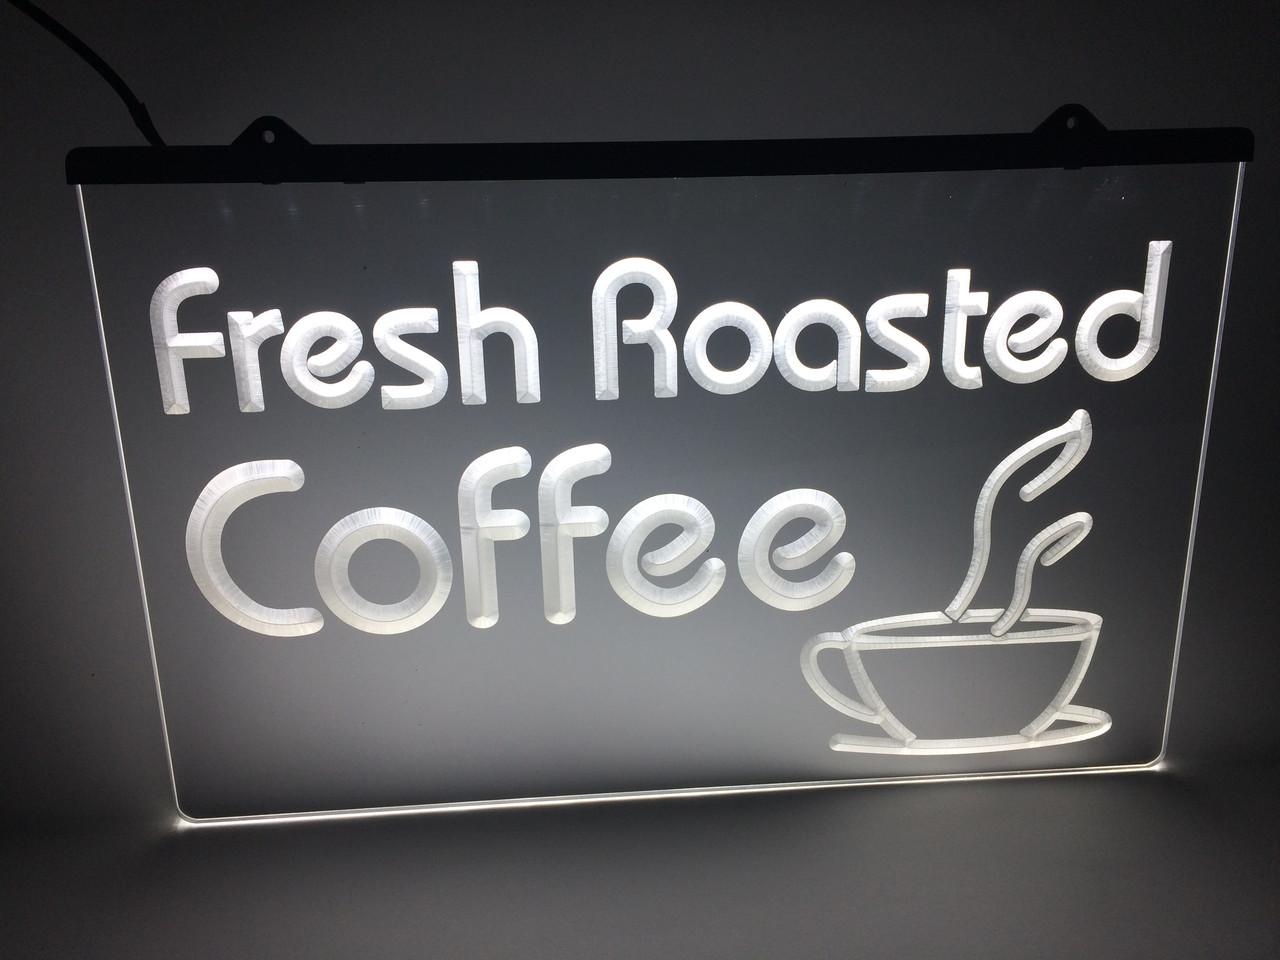 Светодиодная LED табличка Свежая обжарка кофе (Fresh Roasted Coffe) Белая